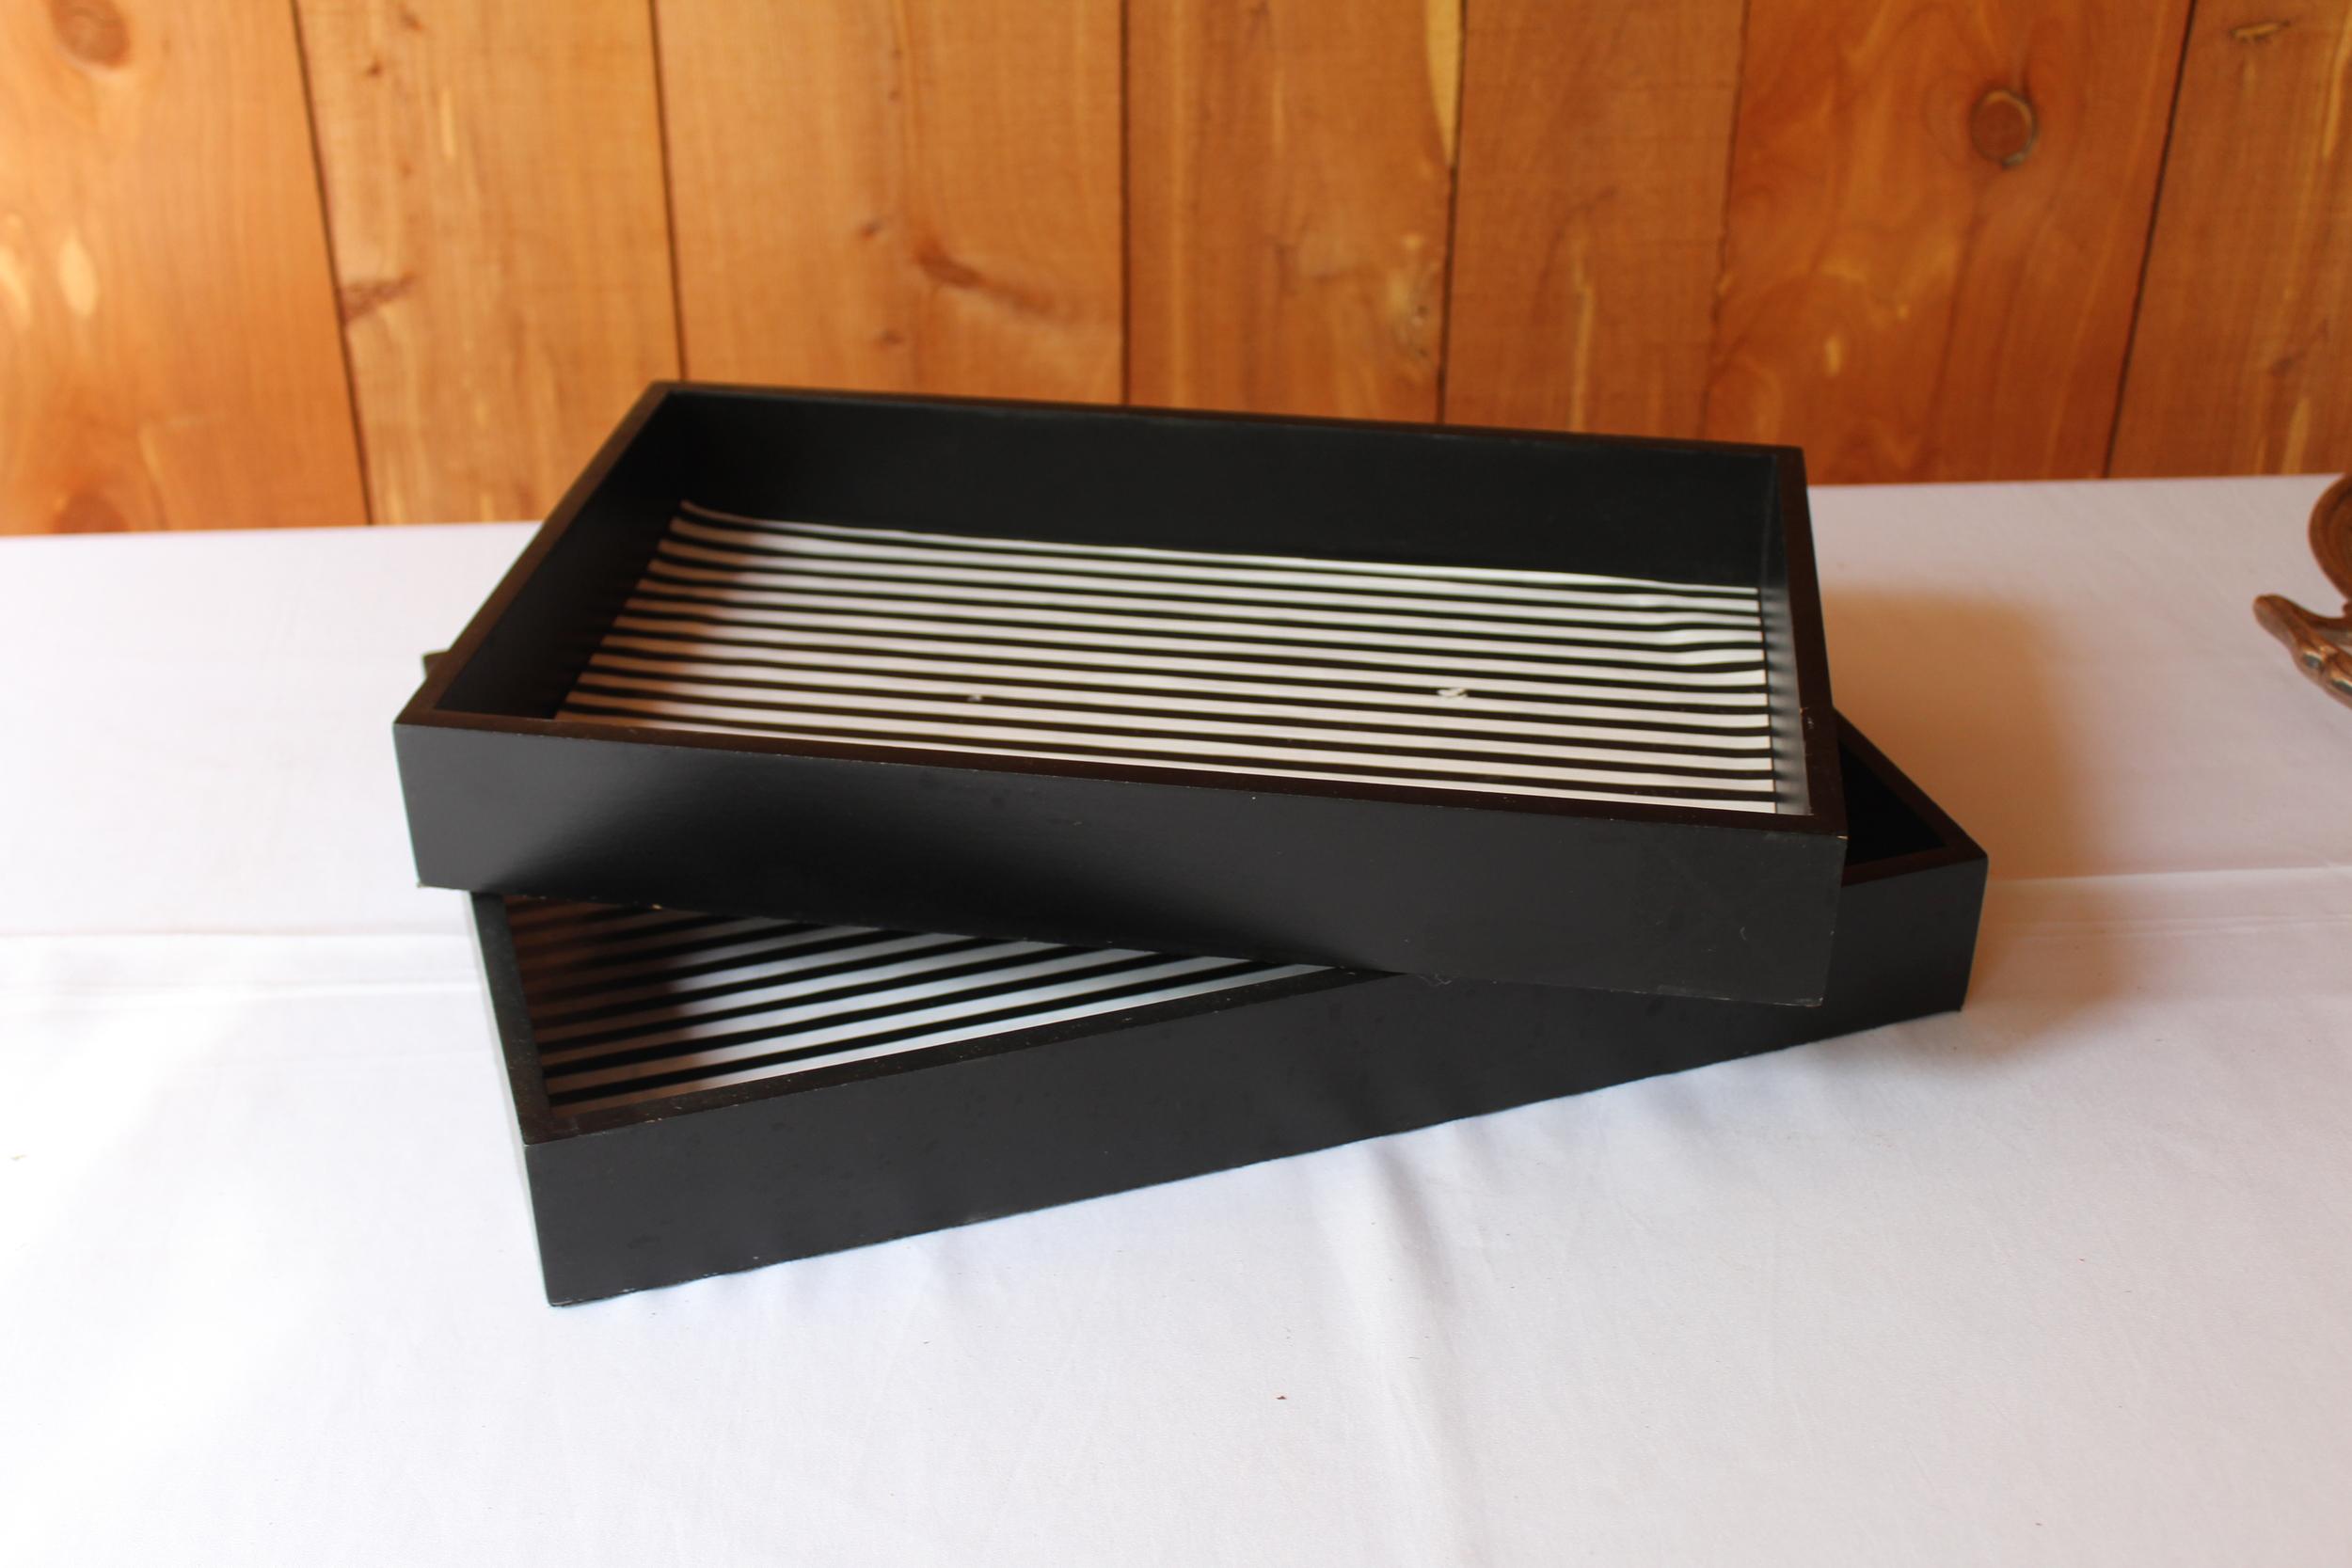 #85 - Black Trays